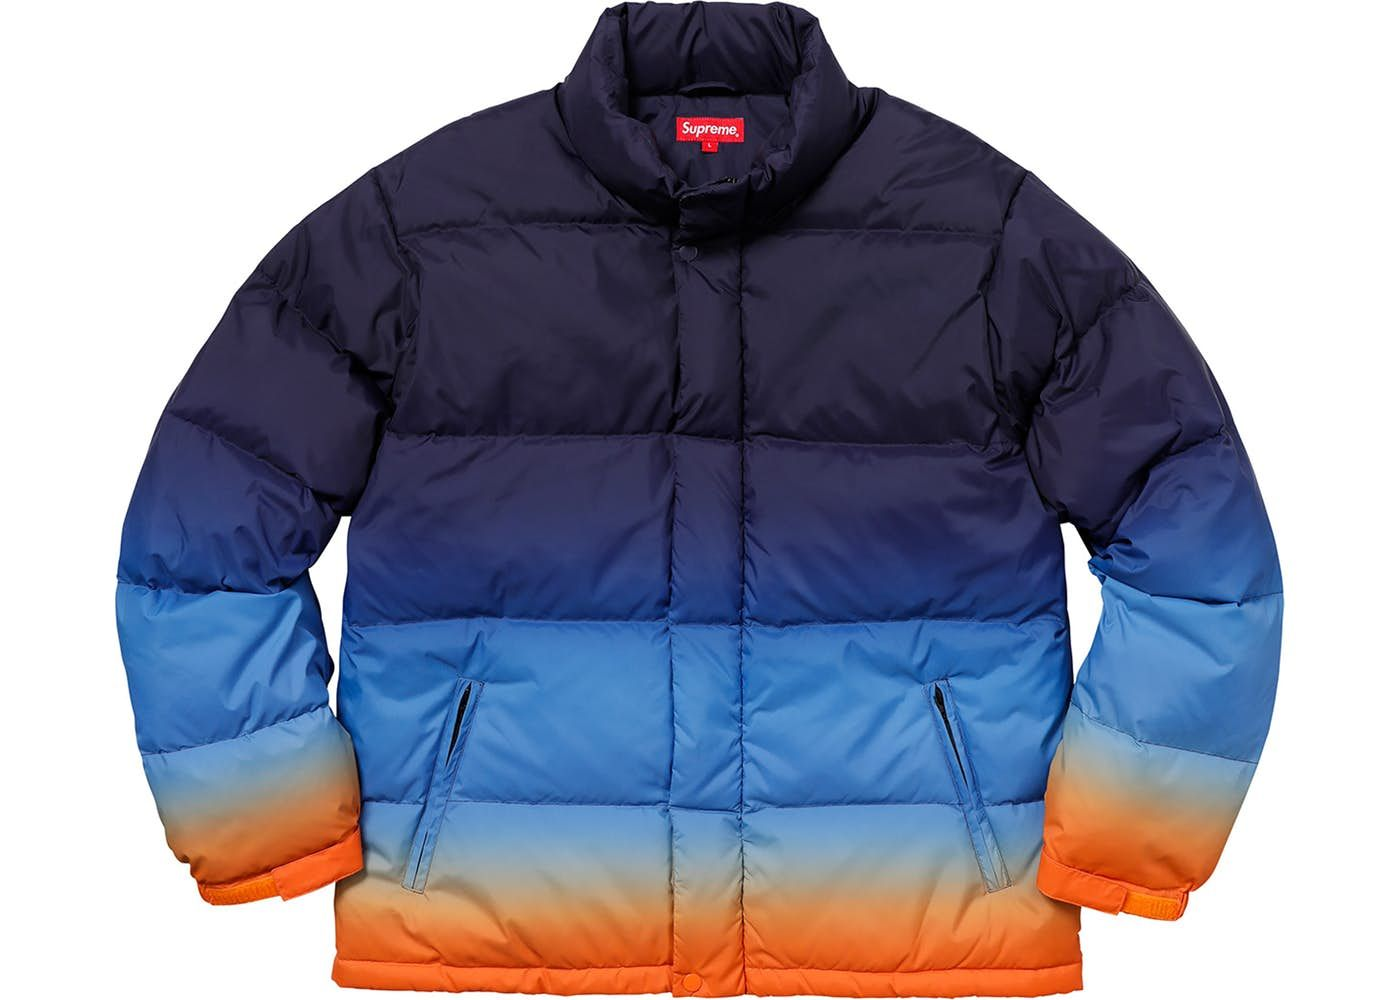 Supreme Gradient Puffy Jacket Navy Puffy Jacket Jackets Blue Puffer Jacket [ 1000 x 1400 Pixel ]